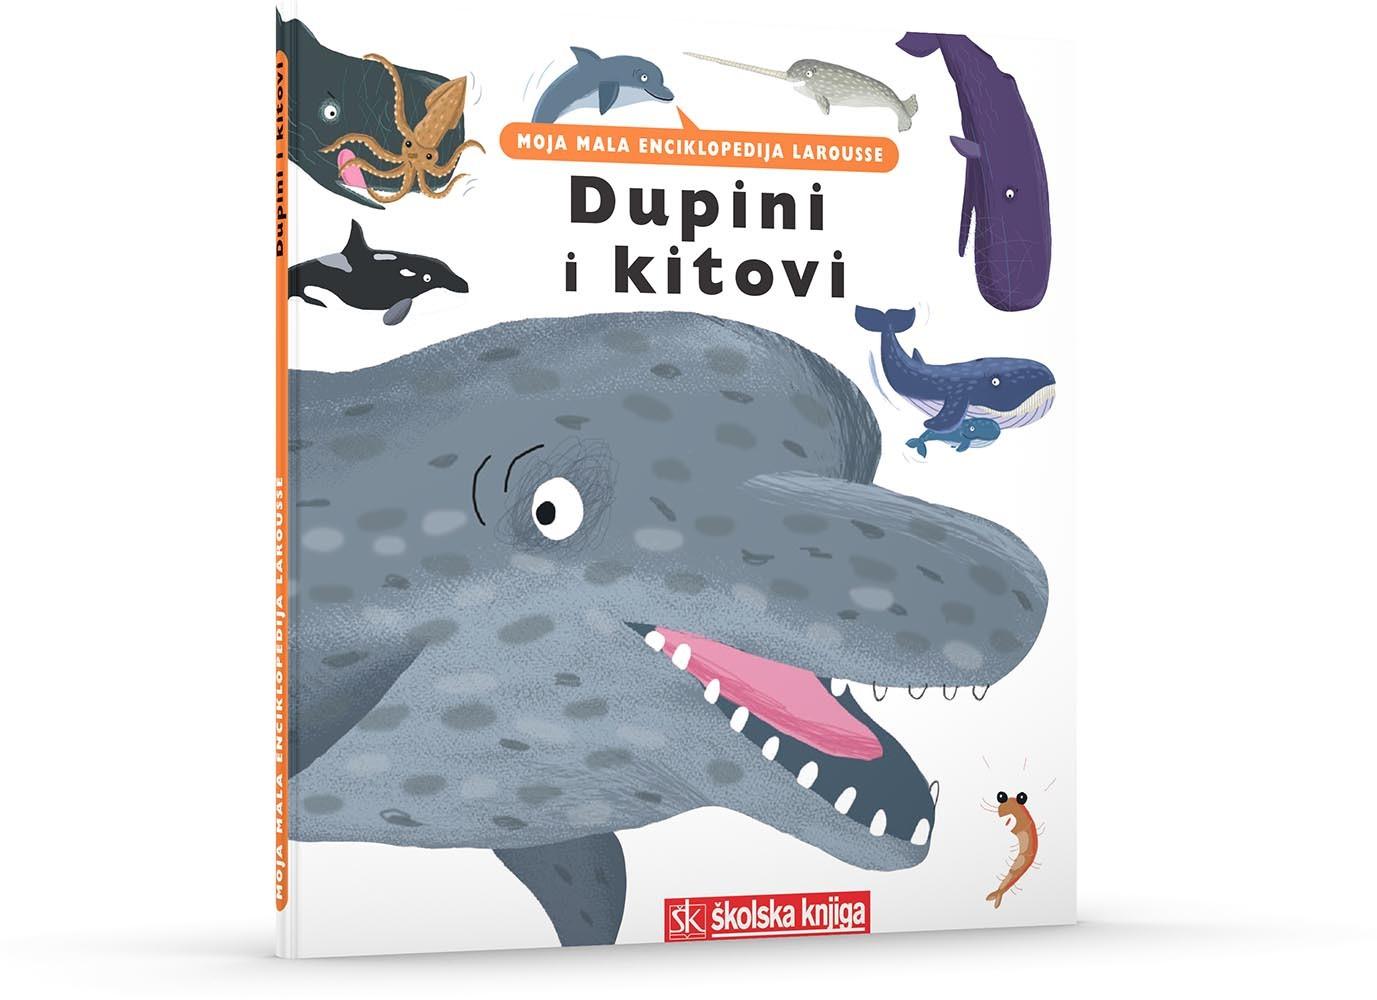 Dupini i kitovi - Moja mala enciklopedija Larousse (svezak 7.)